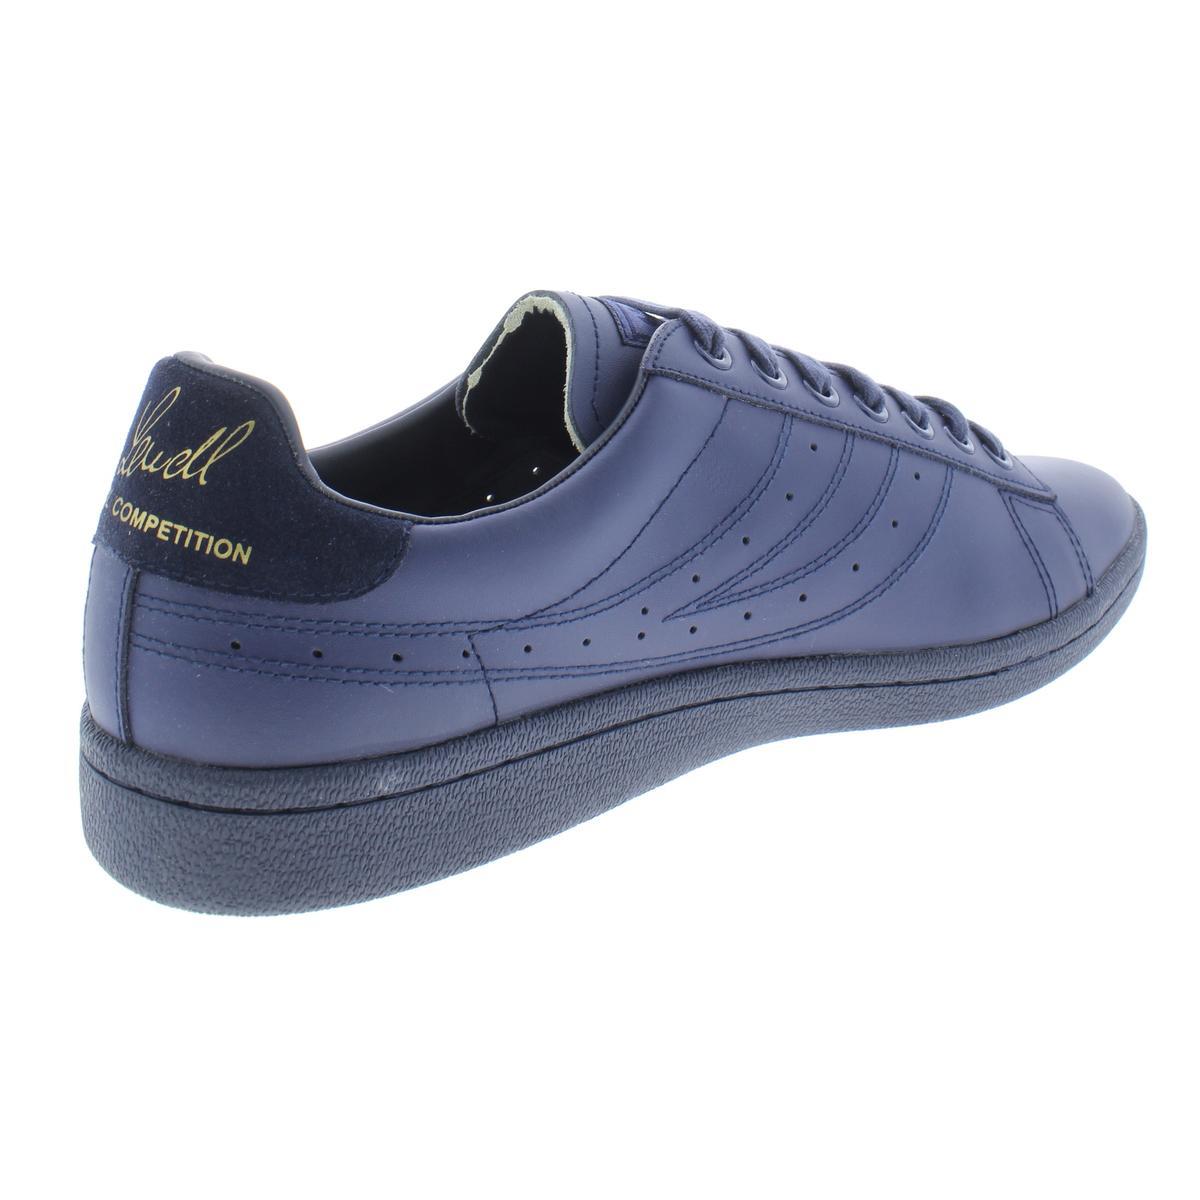 Superga-Mens-4832-Efglu-Leather-Trainer-Classic-Fashion-Sneakers-Shoes-BHFO-7965 thumbnail 6